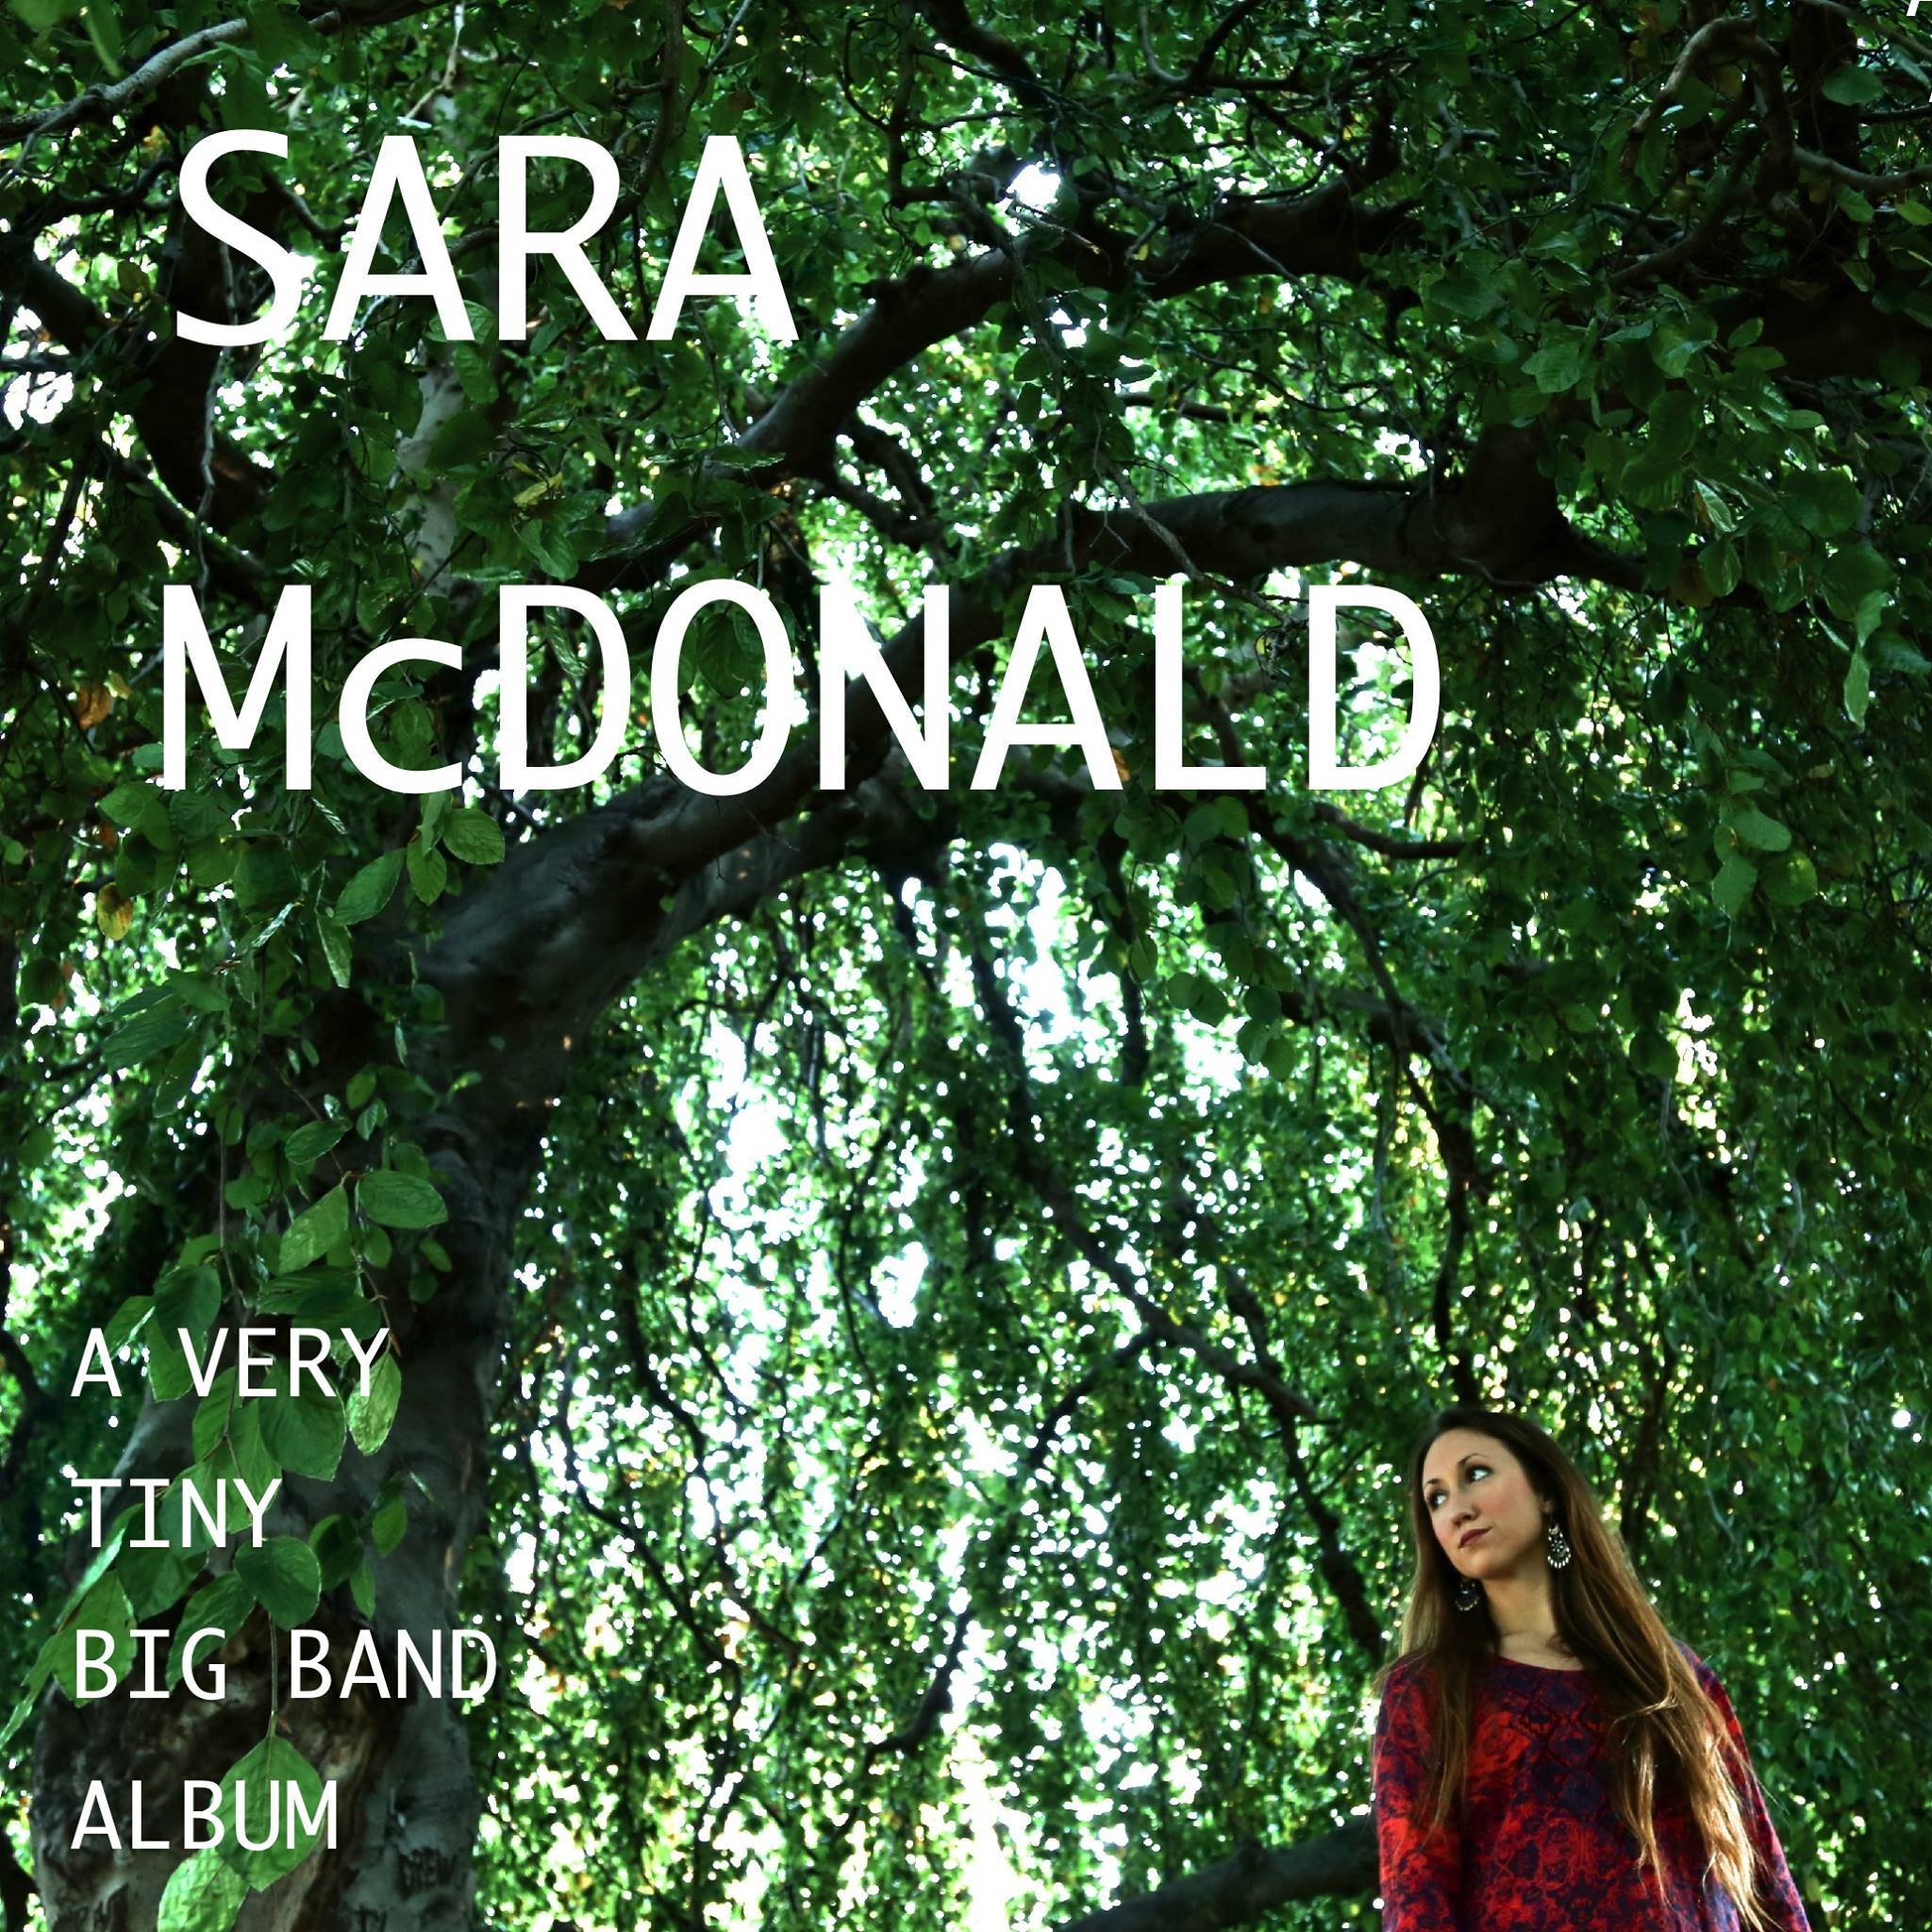 Sara McDonald  Album: A Very Tiny Big Band Album  http://saramcdonaldbigband.bandcamp.com